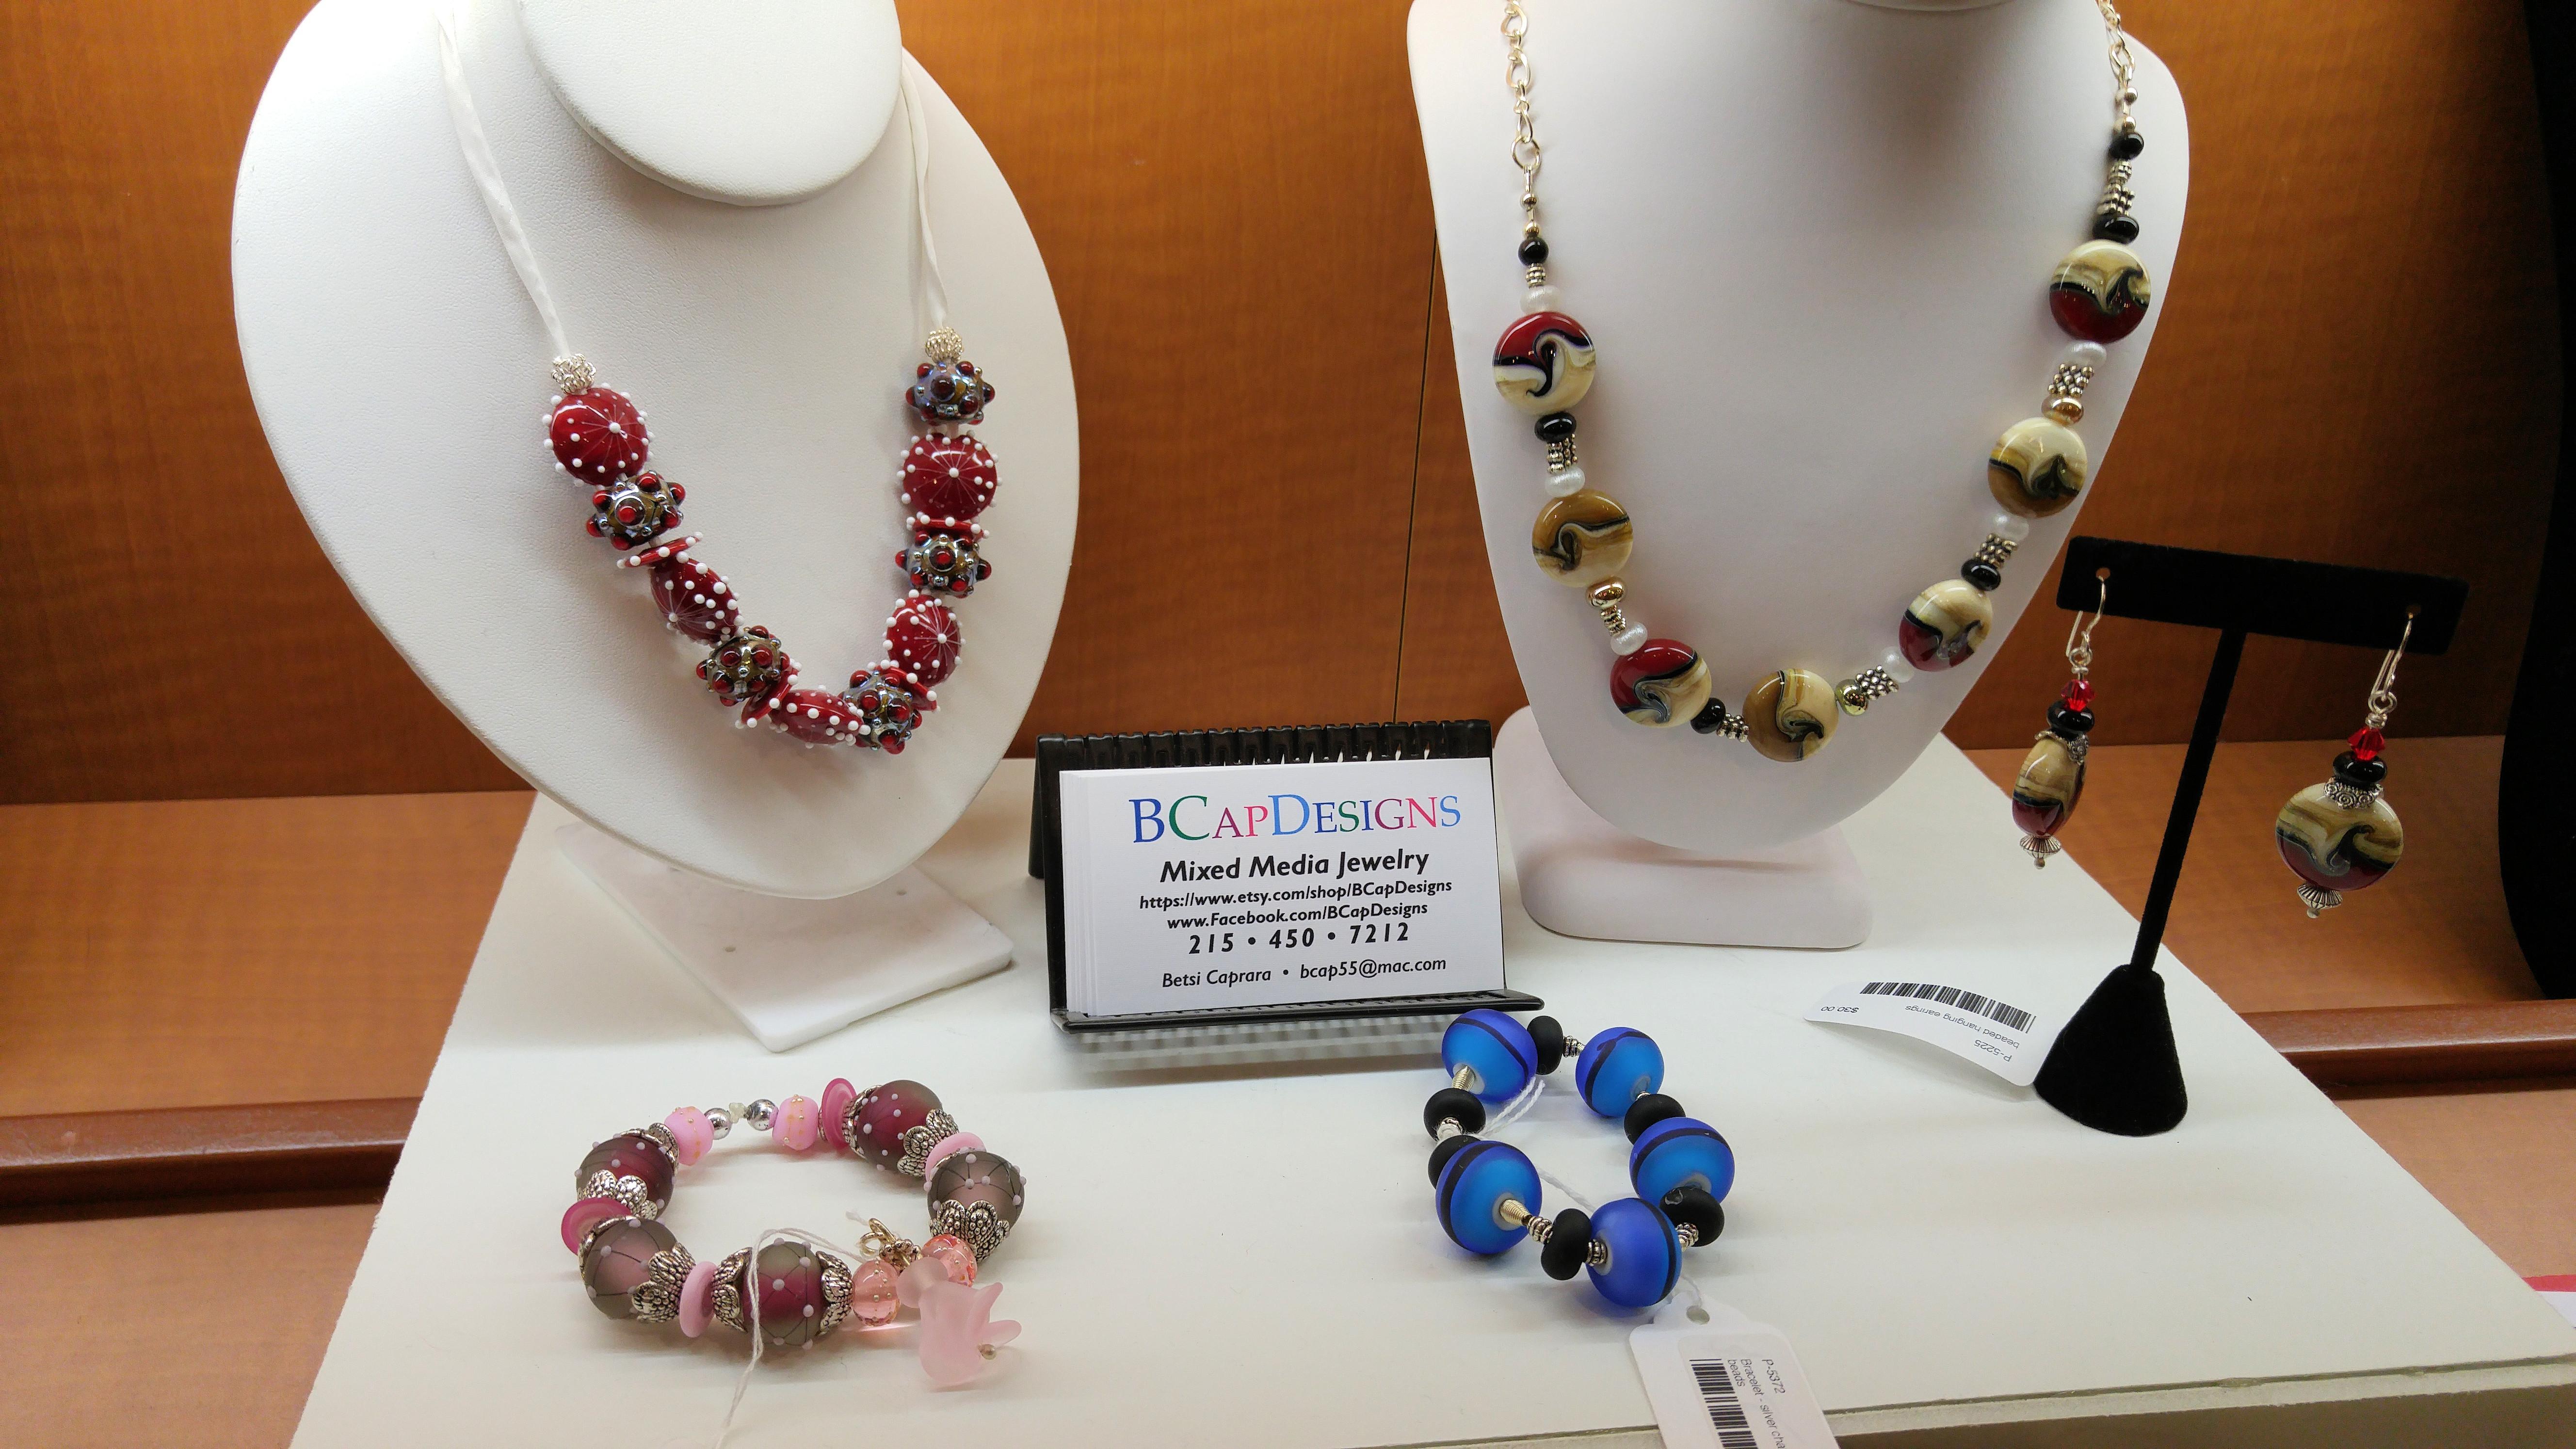 artofit-dec-2016-jewelry-artisan2